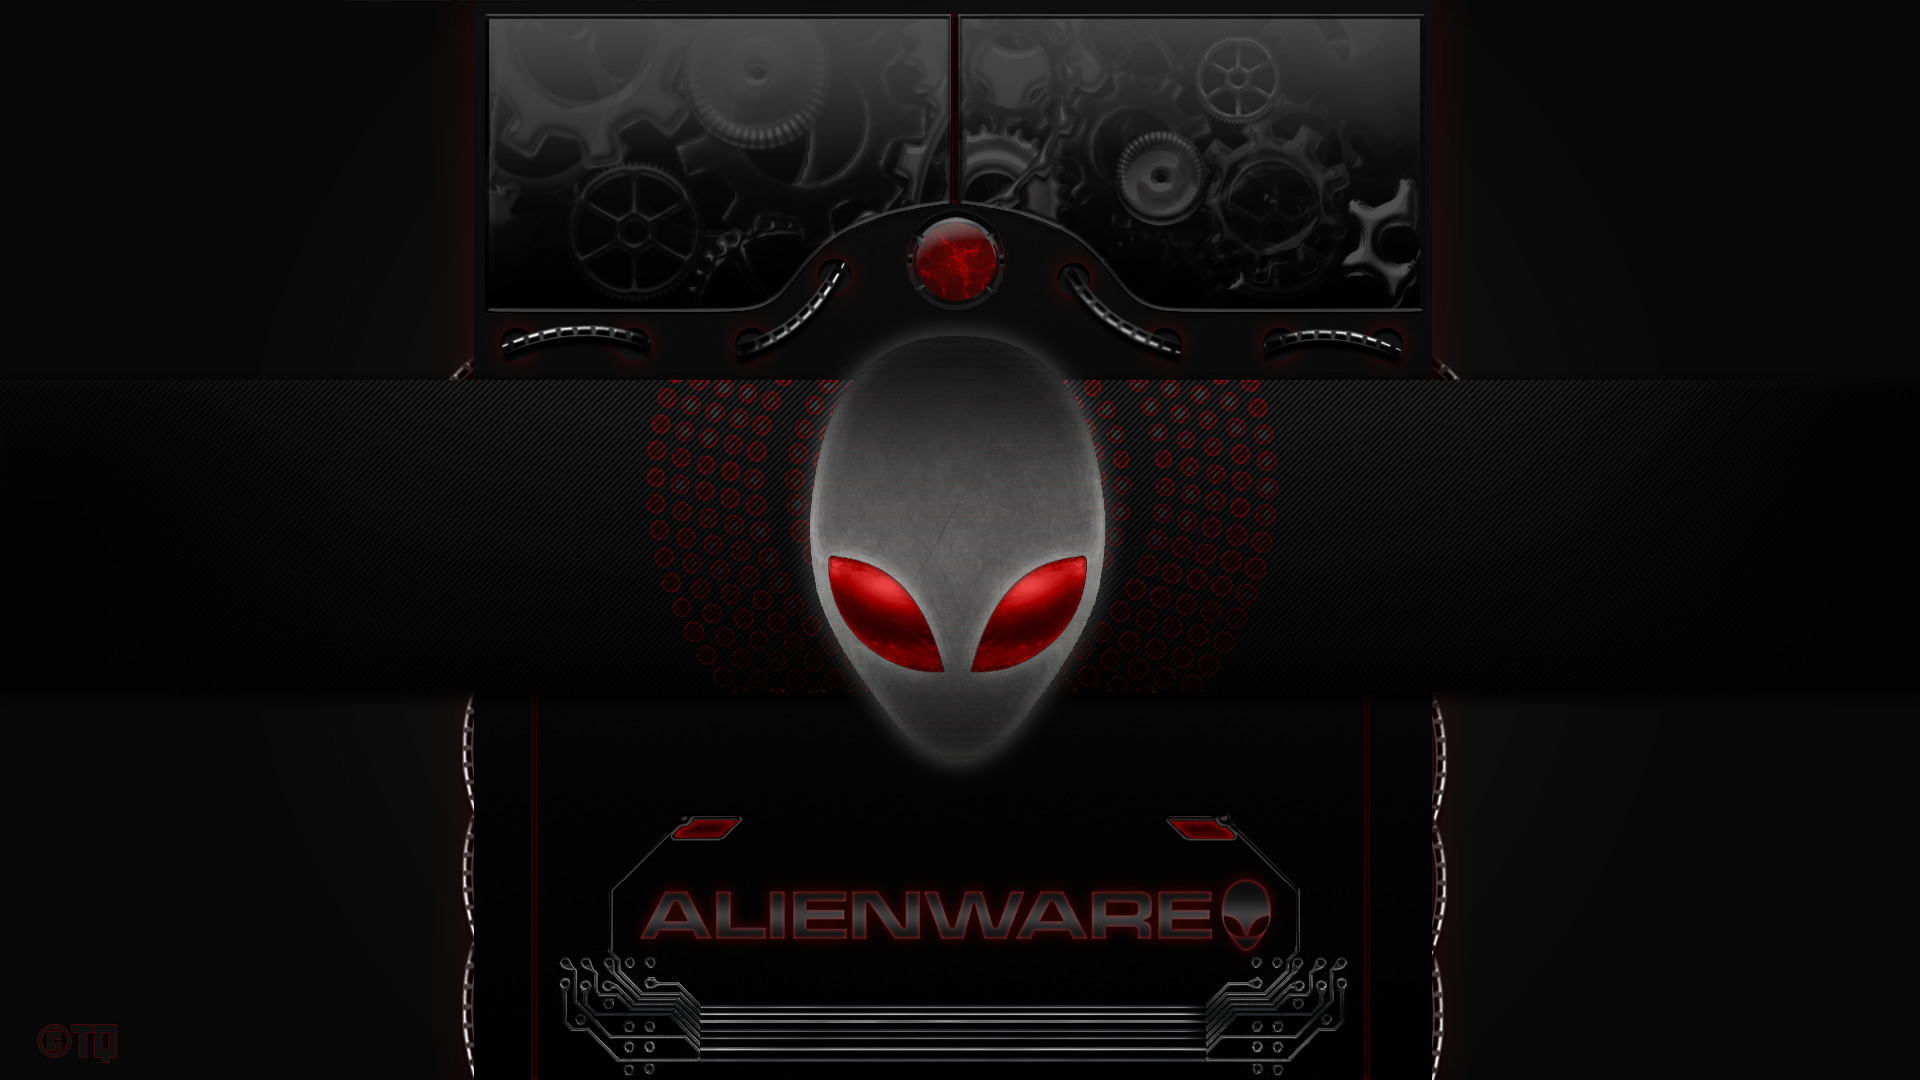 Res: 1920x1080, Alienware wallpaper by TerraroQ Alienware wallpaper by TerraroQ